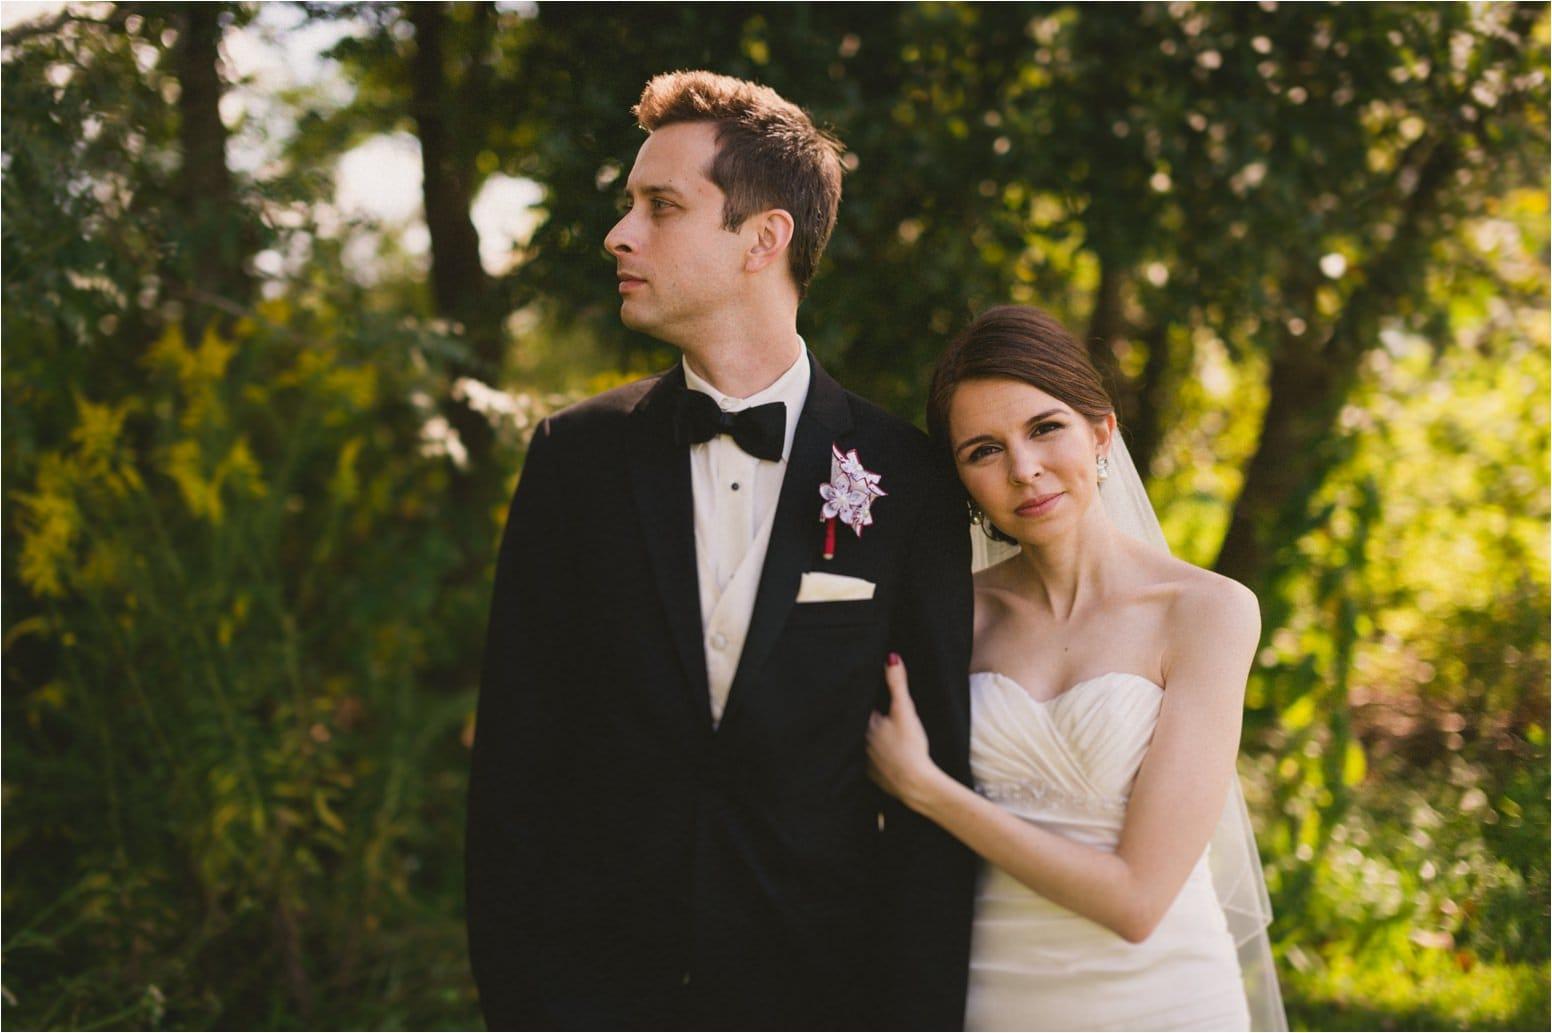 New Orleans Wedding Photographers - Dark Roux Photography 40